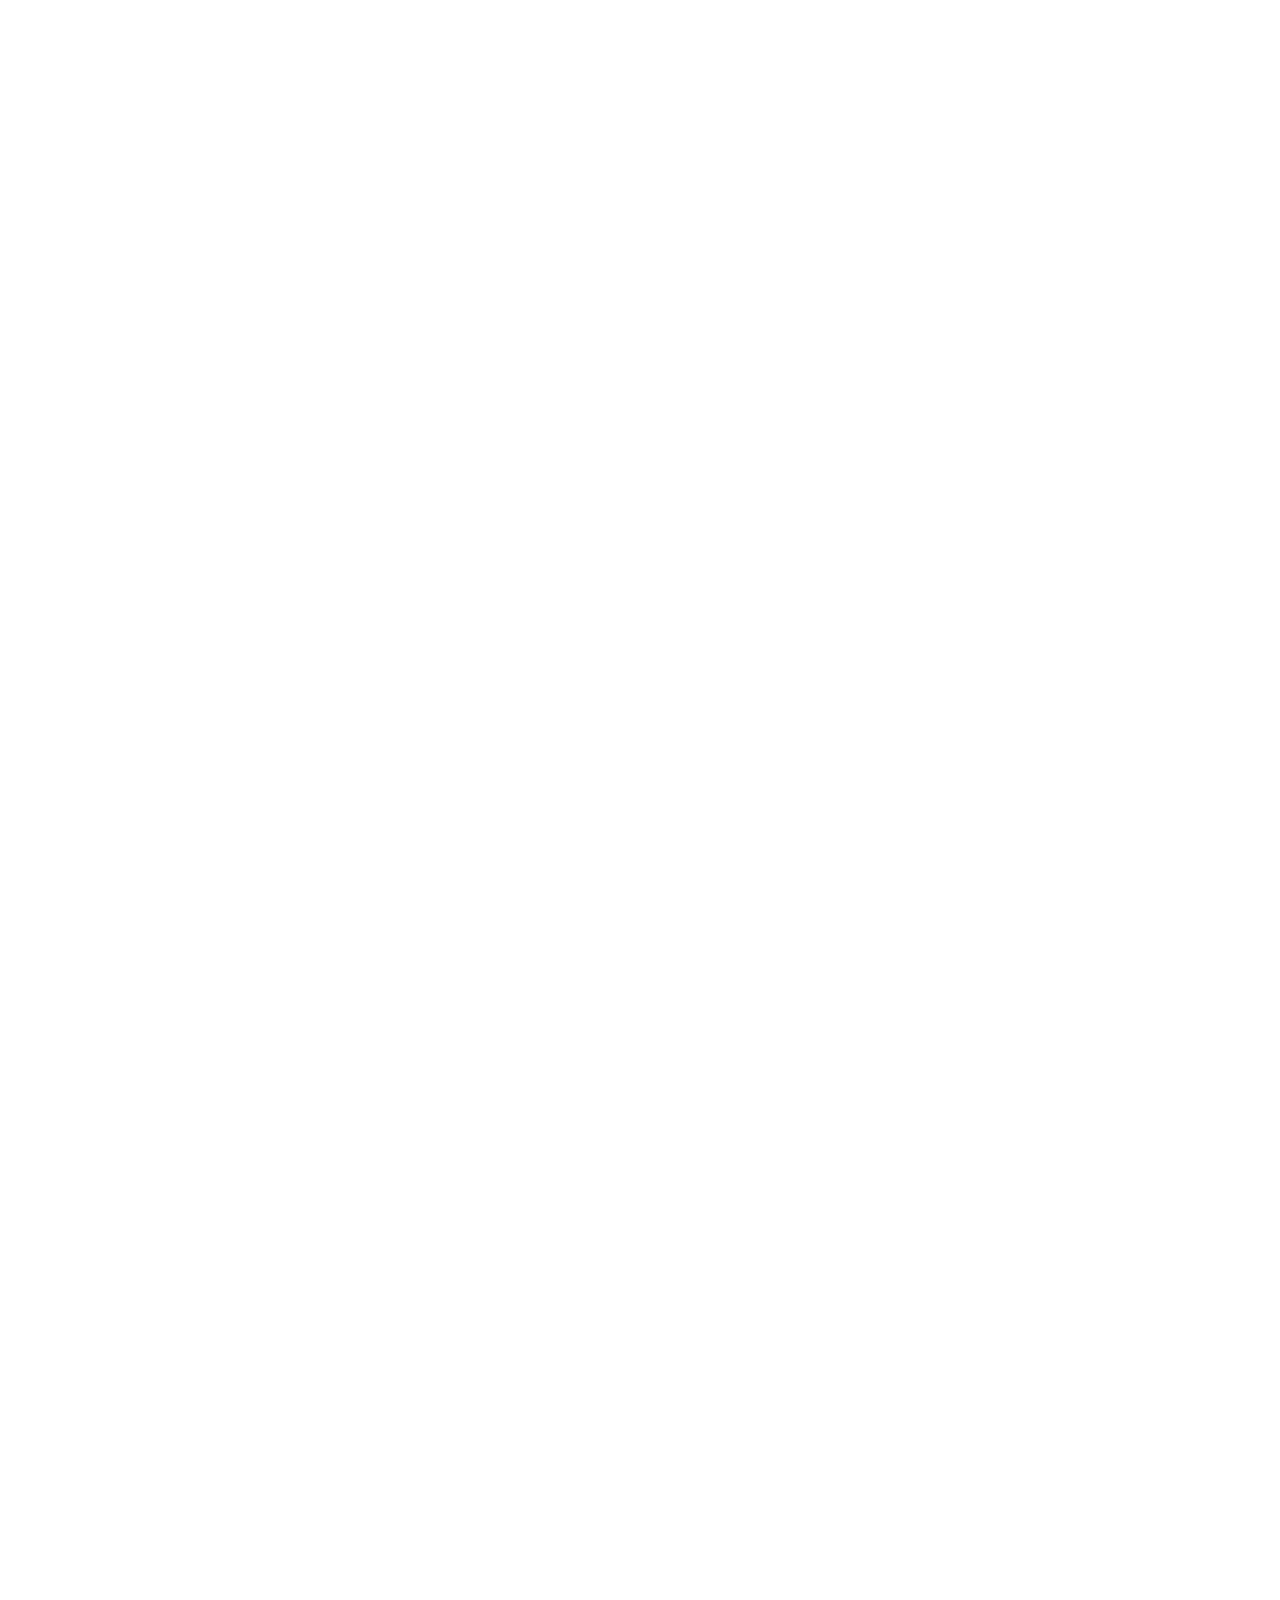 CHIARA Standard Profile Arch Top 3/4's Lite Decorative Glass Double Iron Door – CHIARA OID-6080-CHI1PAT